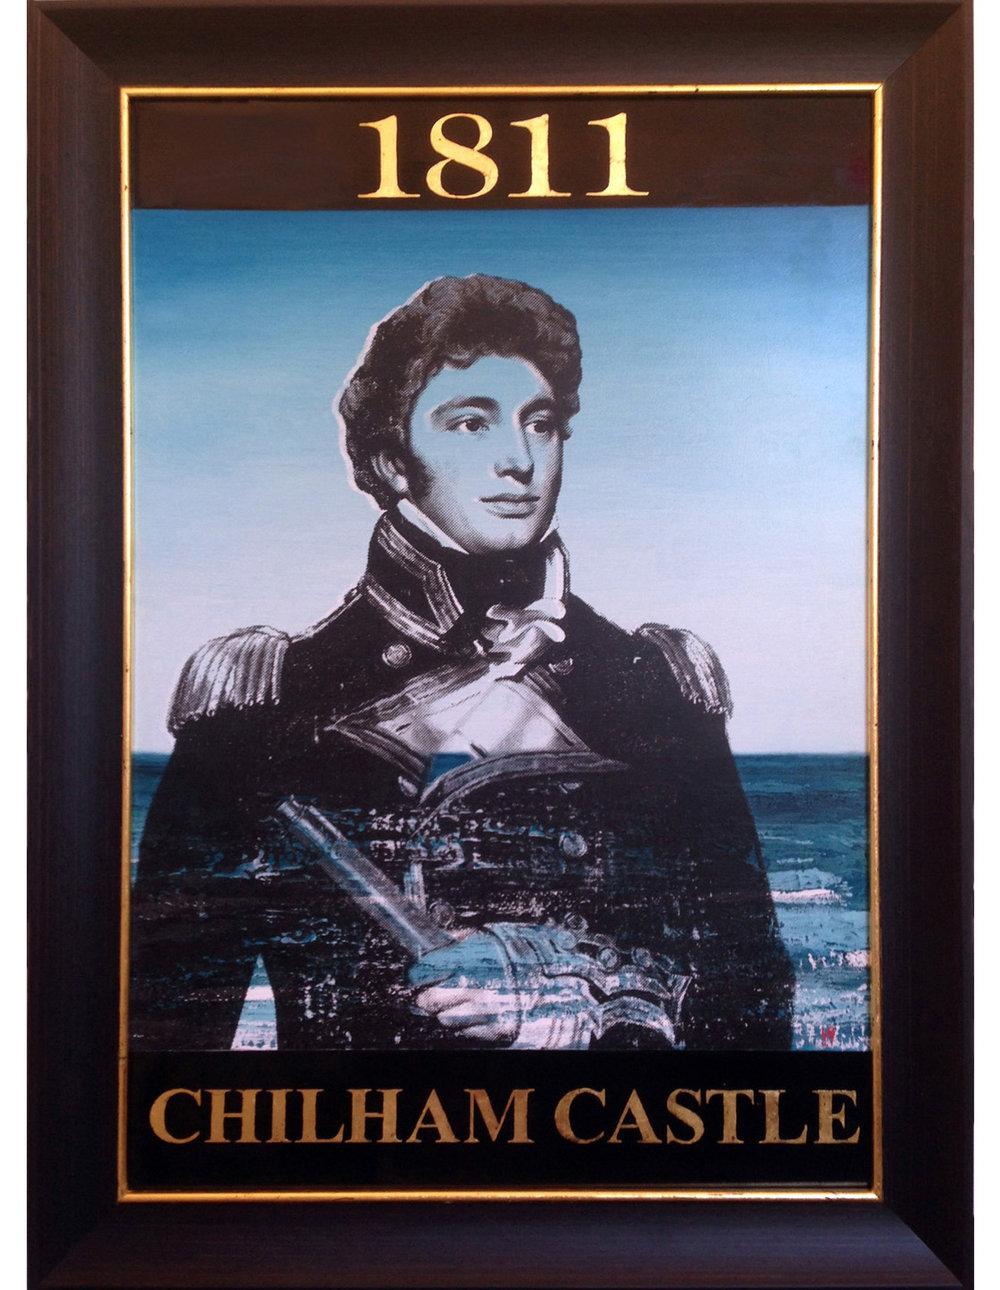 w Chilham Castle 1811.jpg